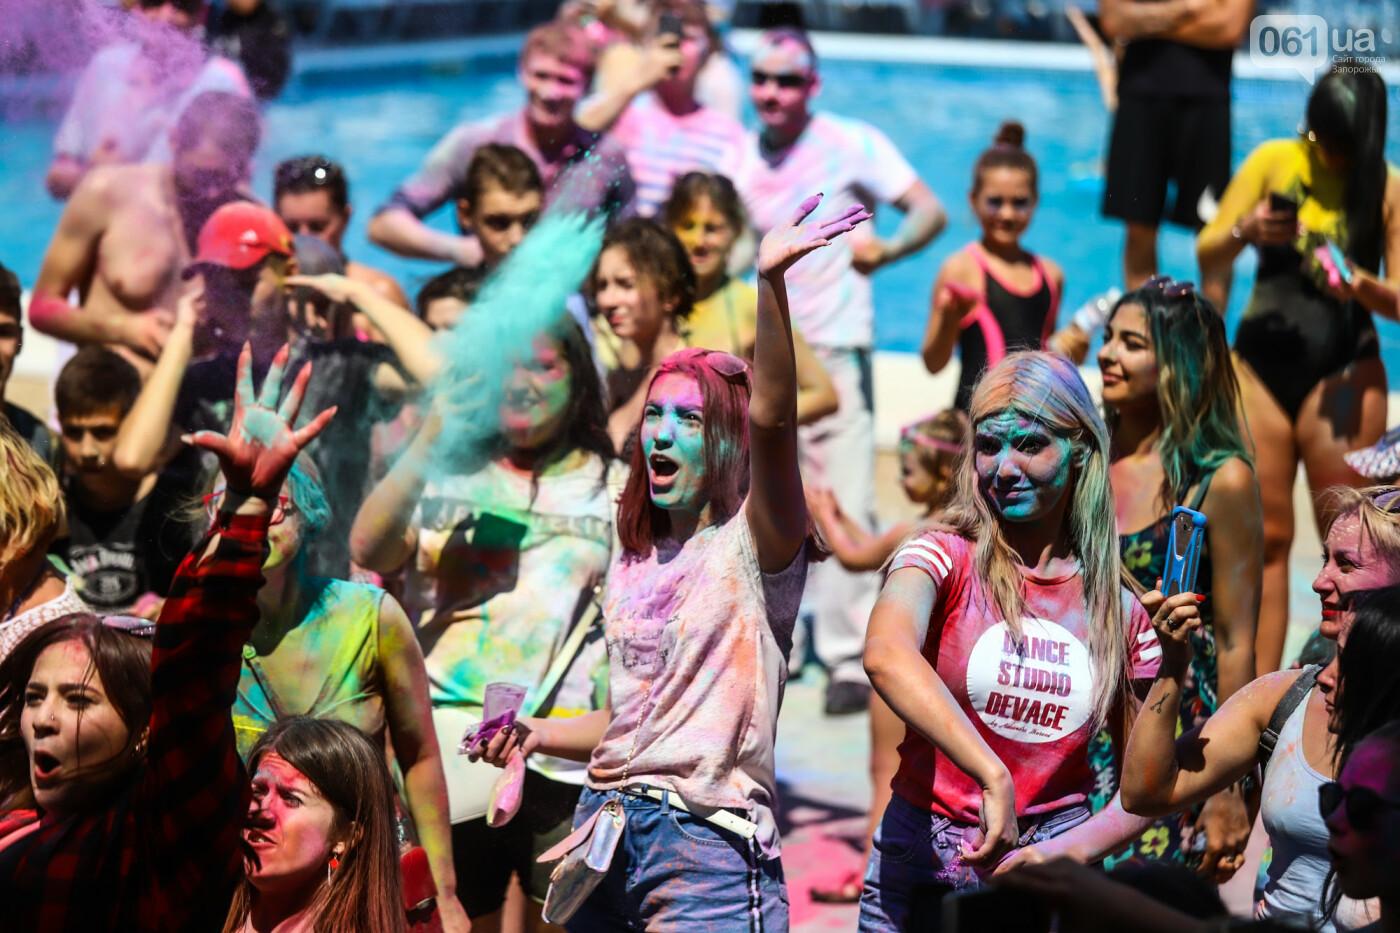 Сотни запорожцев приняли участие в фестивале красок Холи, - ФОТОРЕПОРТАЖ, фото-25